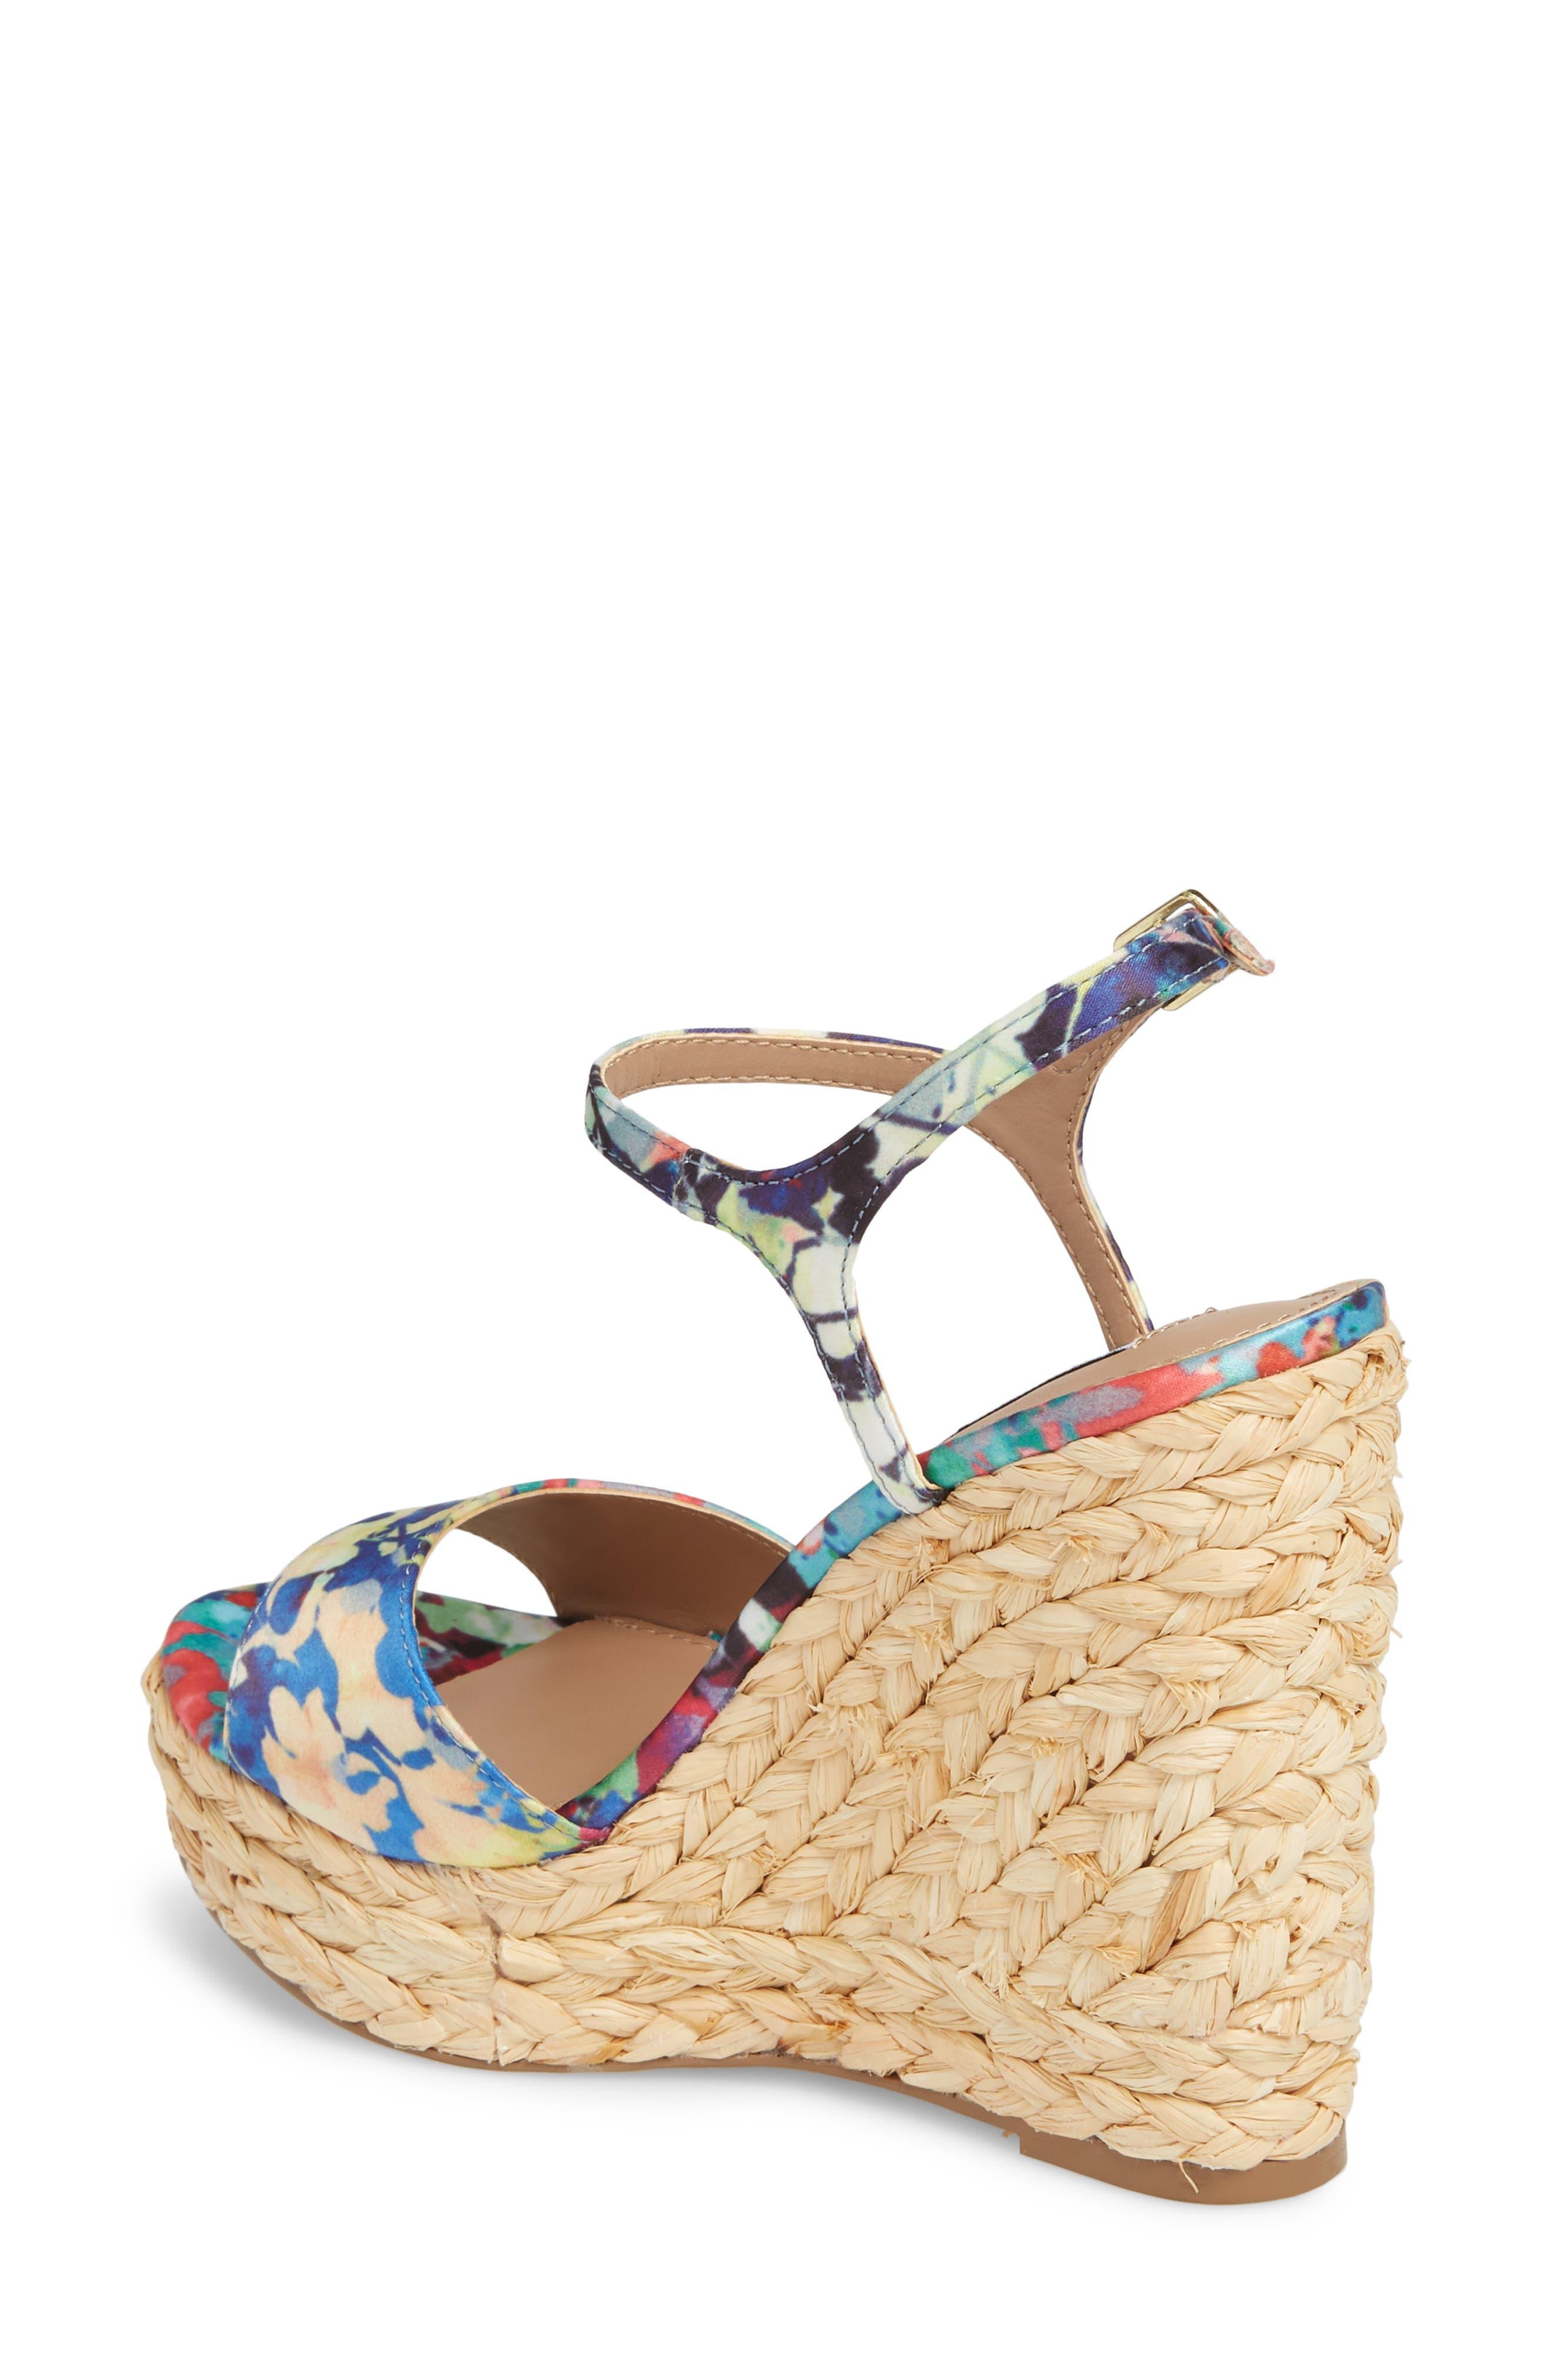 Tokin Espadrille Wedge Sandal,                             Alternate thumbnail 2, color,                             Floral Multi